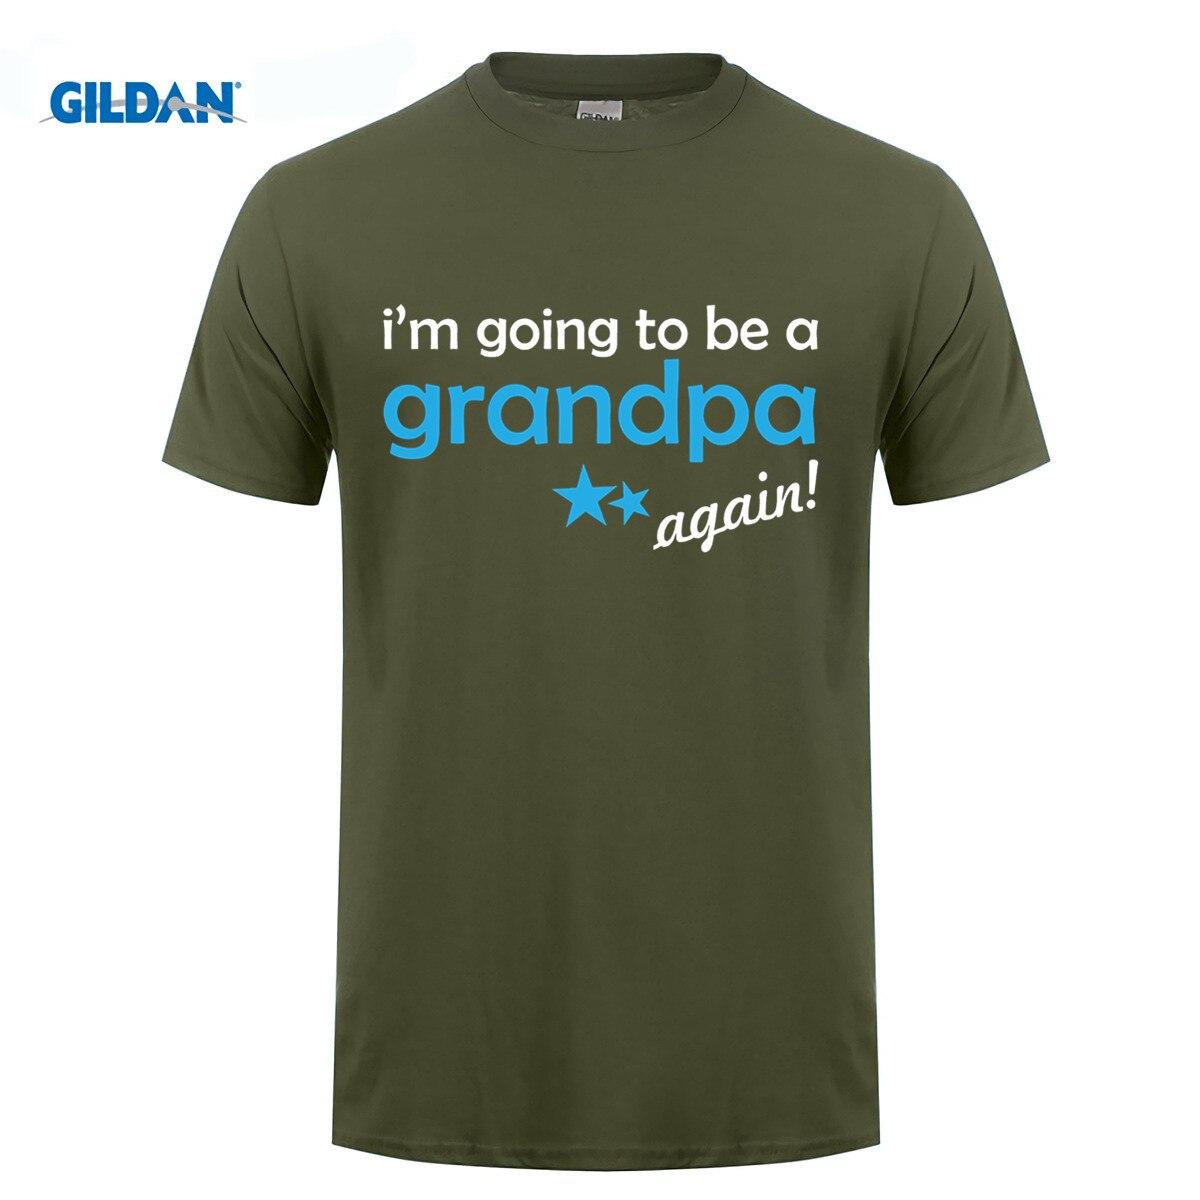 GILDAN Mens Pregnancy Announcement T-Shirt Grandpa Again